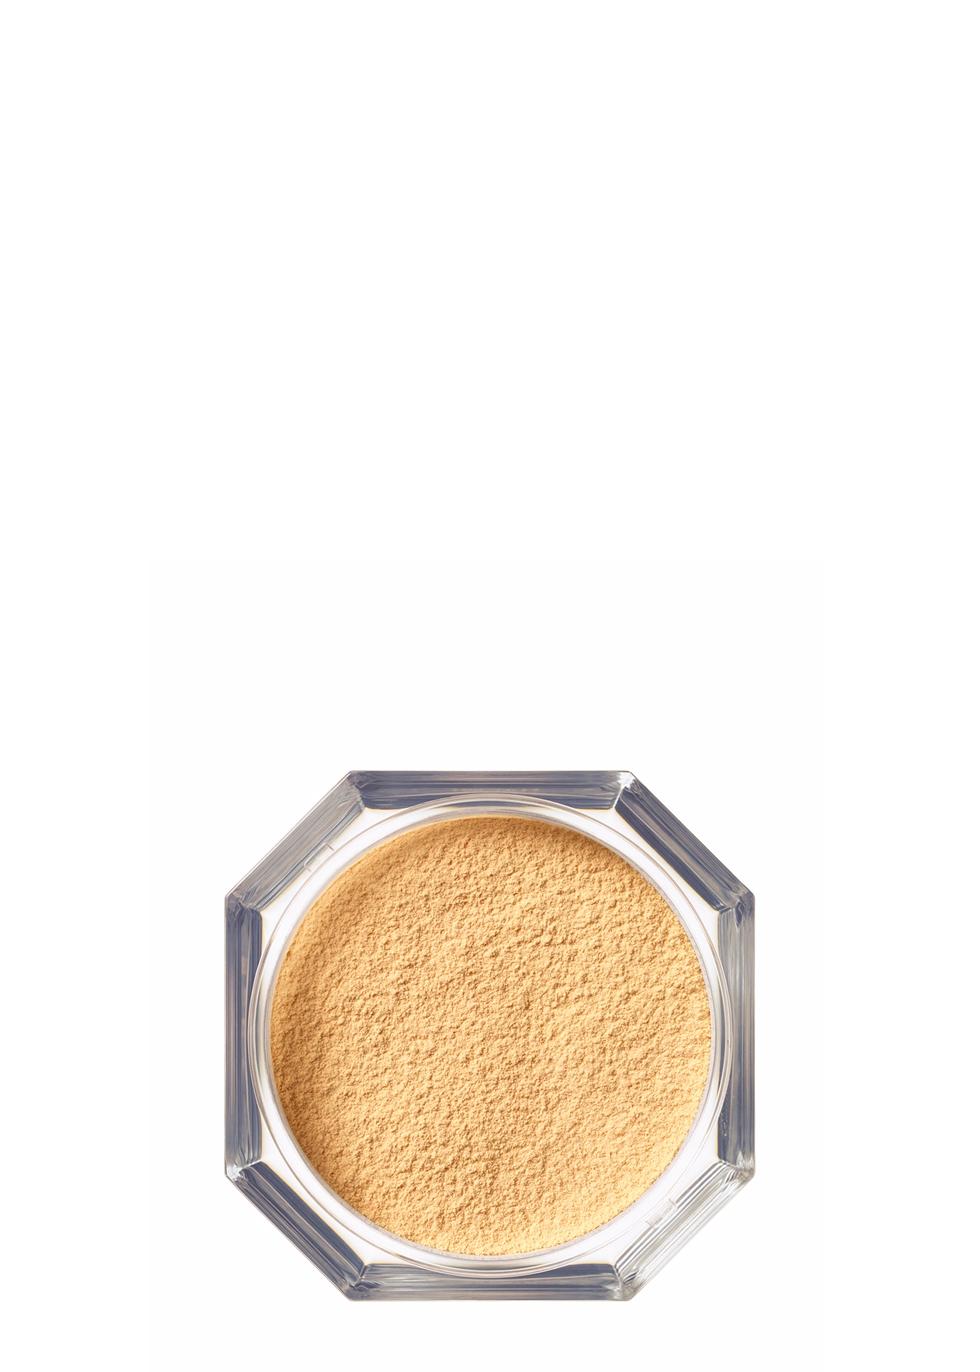 Pro Filt'r Instant Retouch Setting Powder - Banana - FENTY BEAUTY